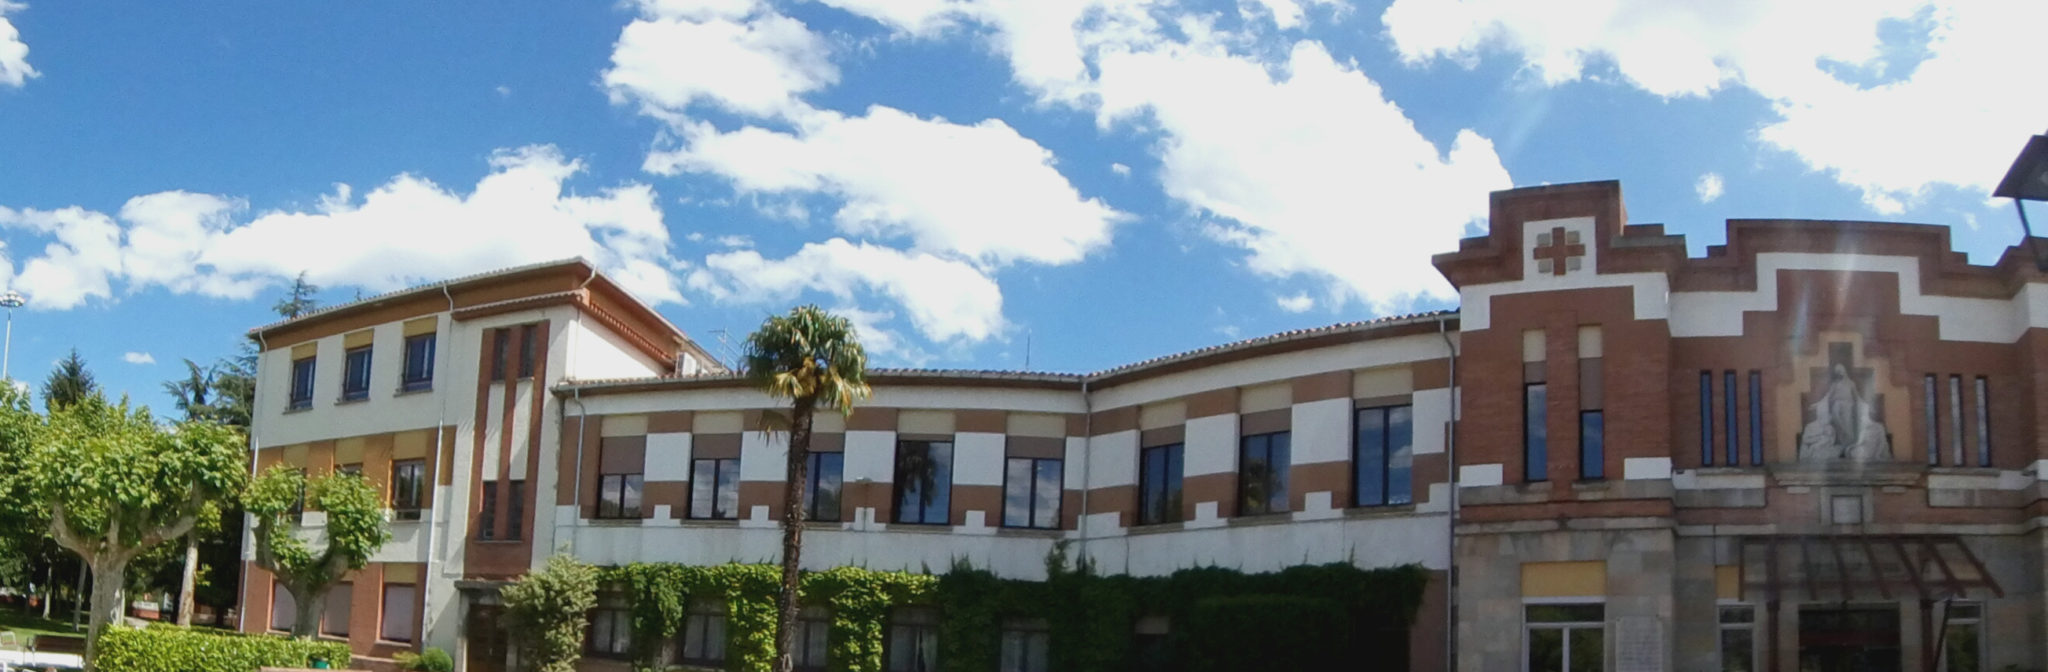 Detalle Fachada Casa De Misericordia